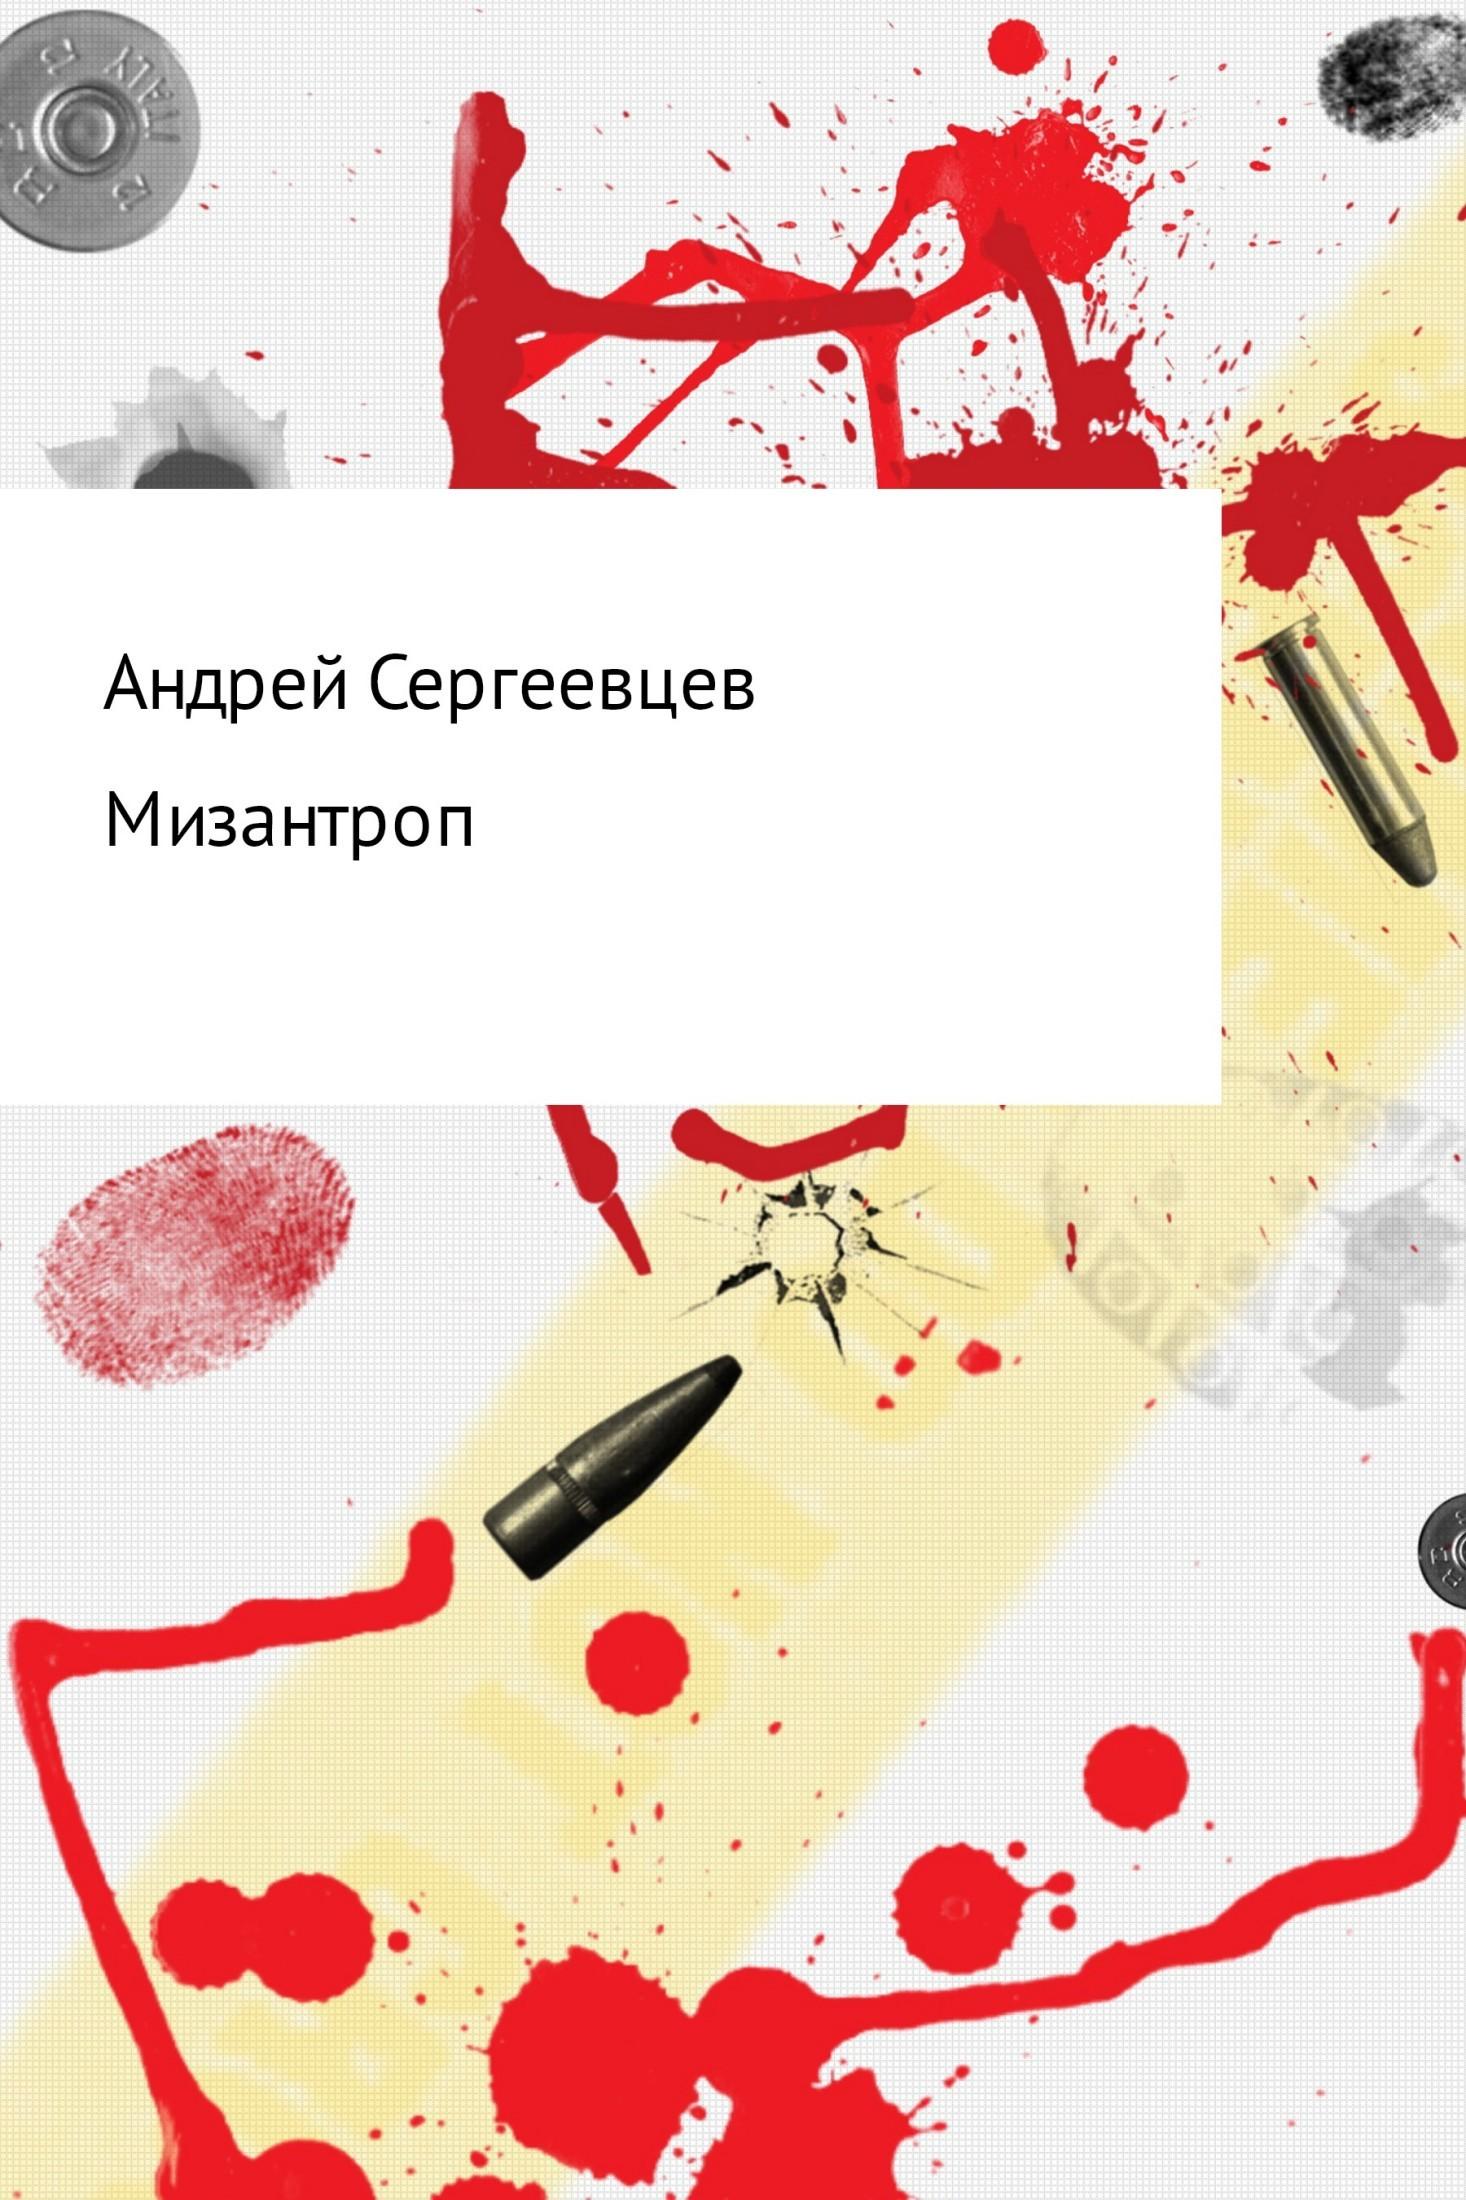 Андрей Сергеевцев - Мизантроп